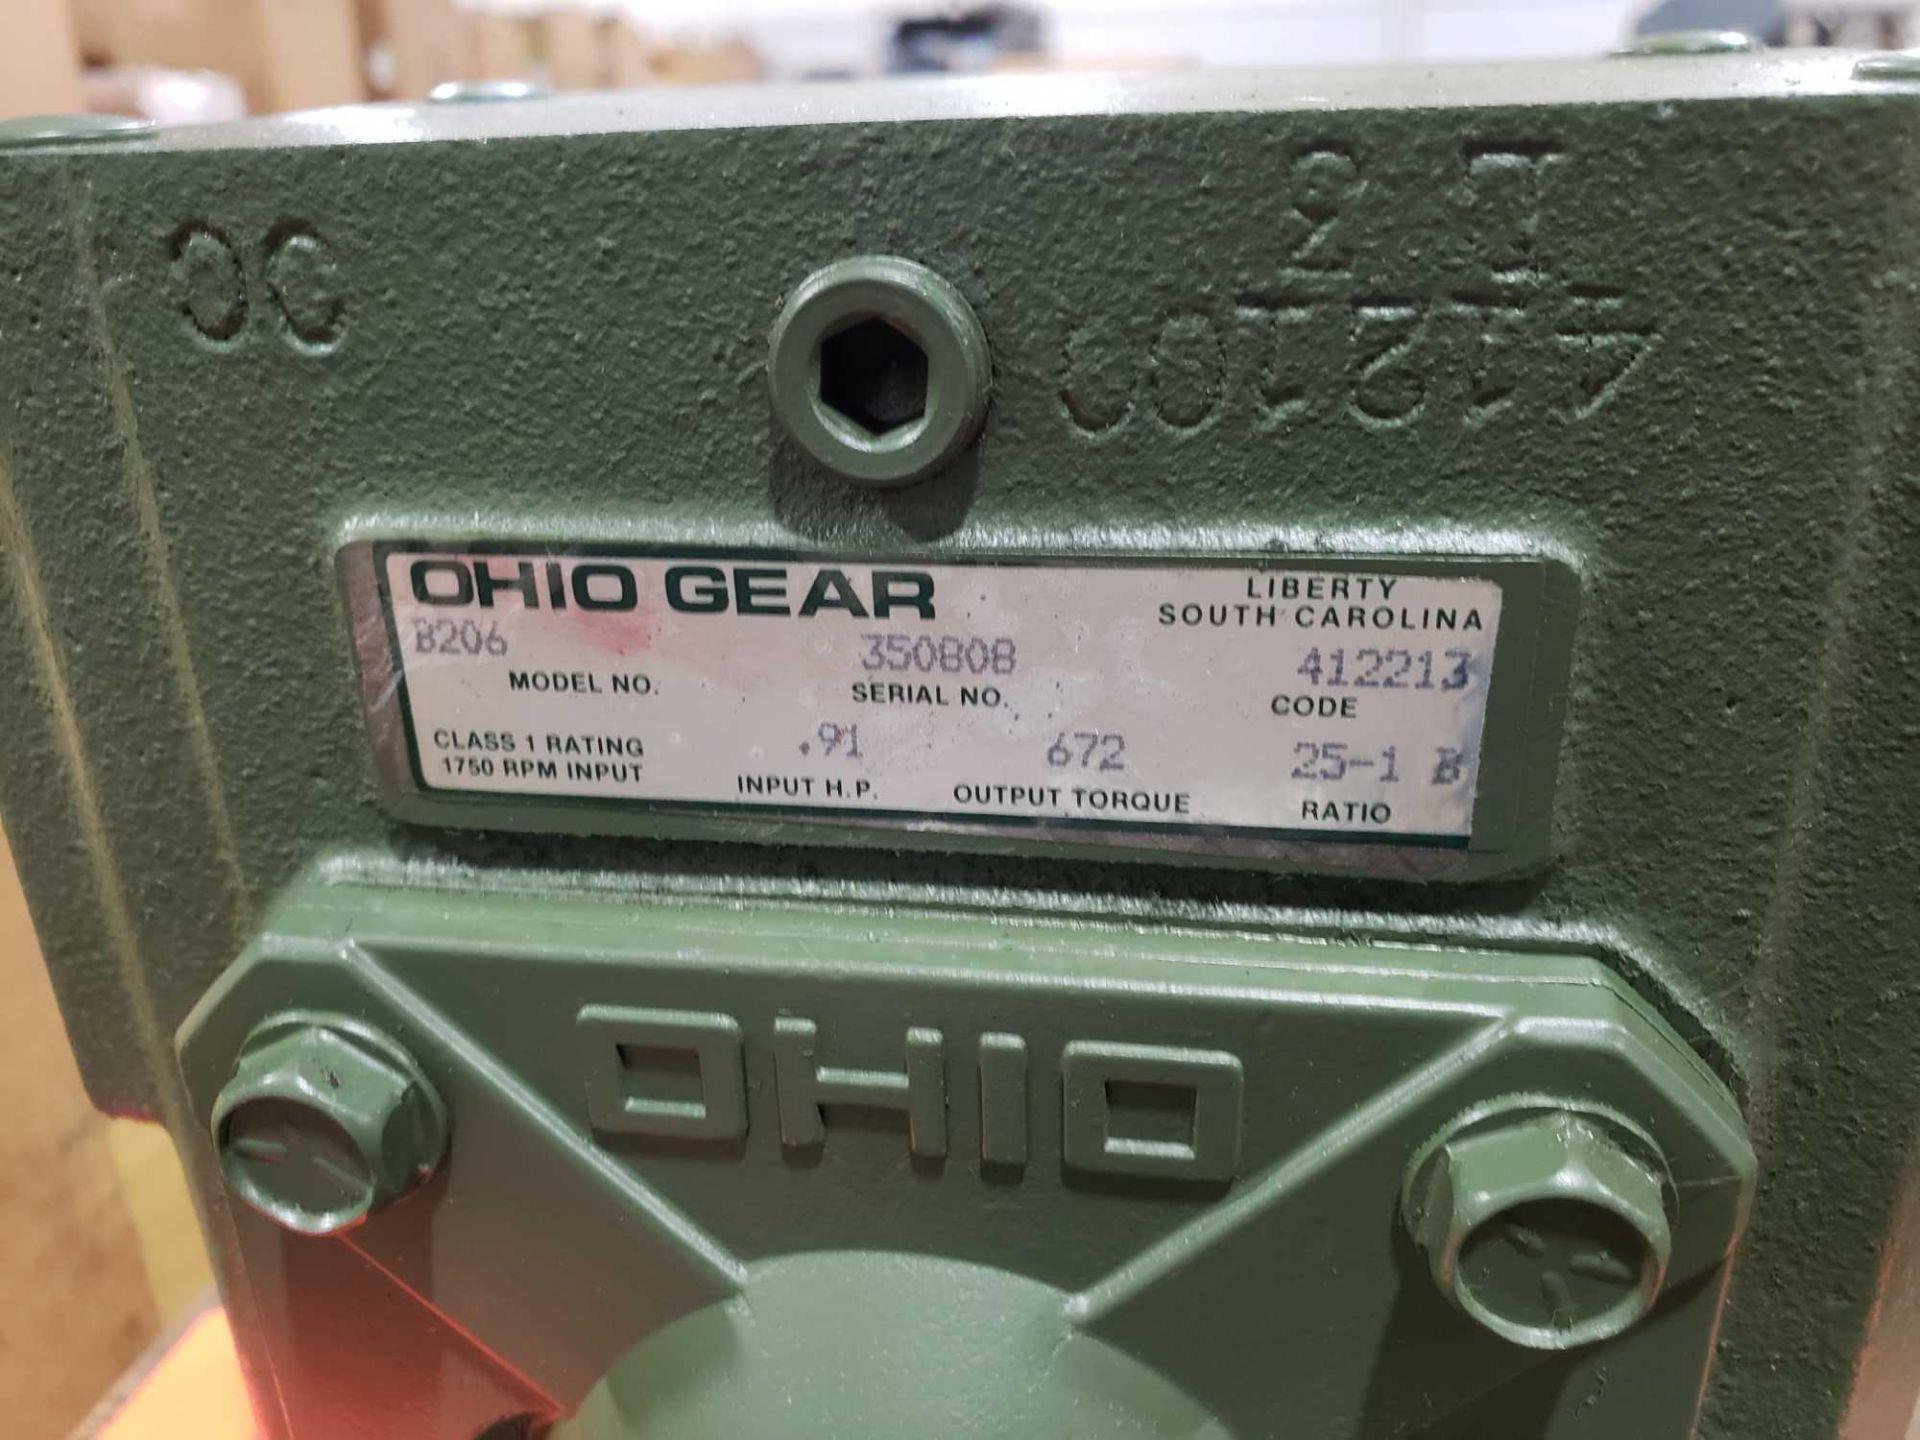 Lot 29 - Ohio Gear model B-206 gearbox. 25-1 C ratio. New in box.